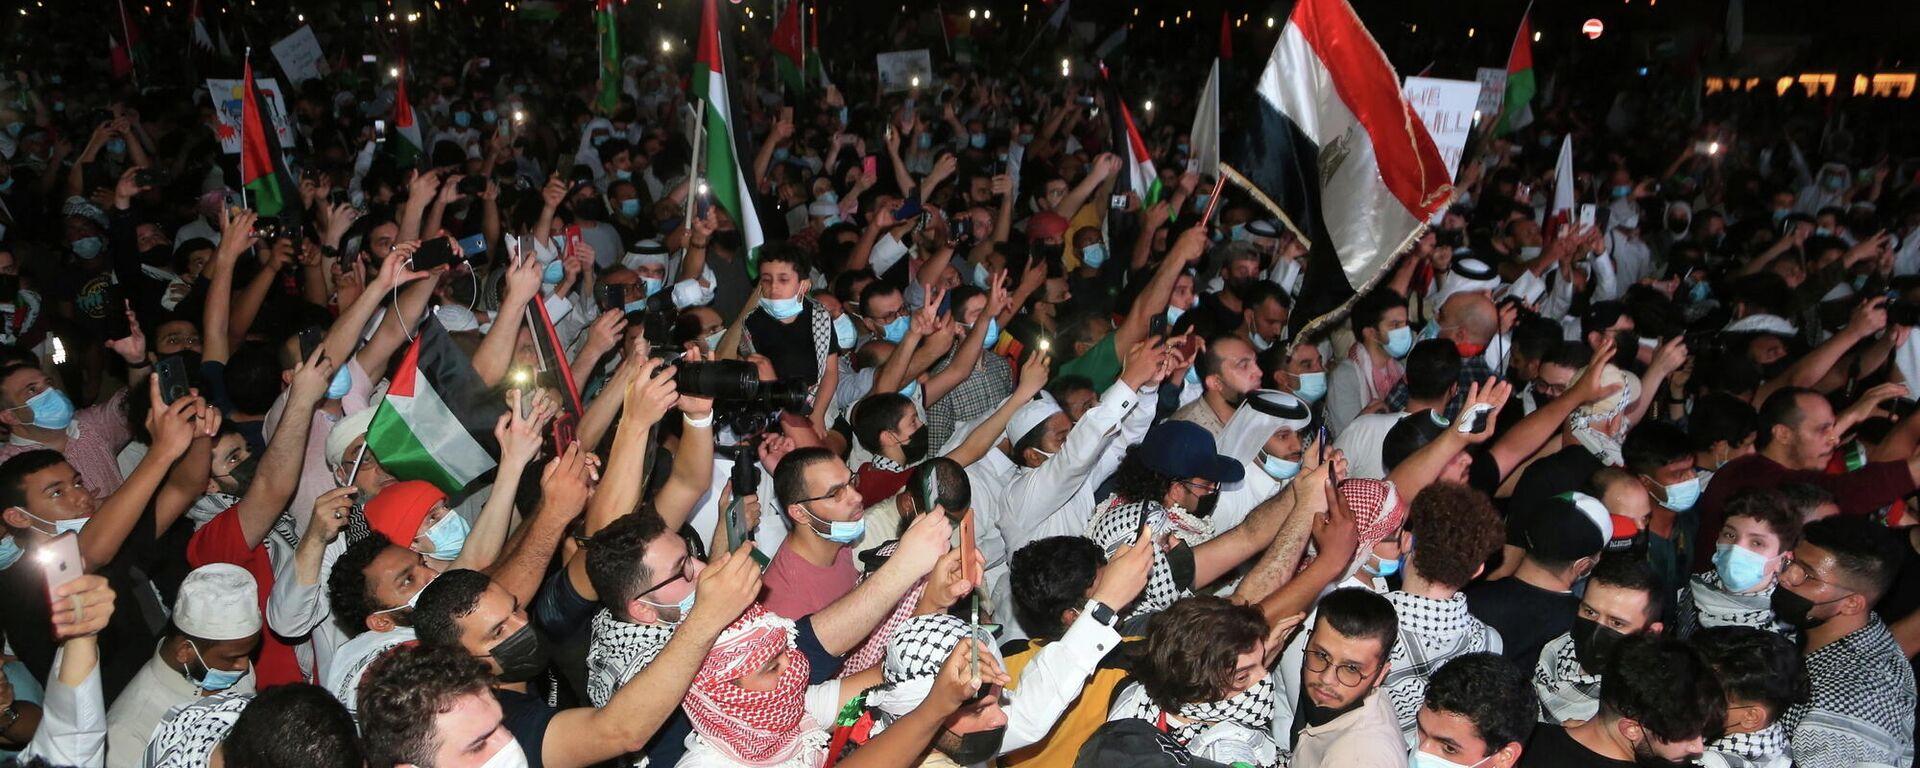 Manifestación en apoyo a Palestina en Doha, Catar - Sputnik Mundo, 1920, 16.05.2021